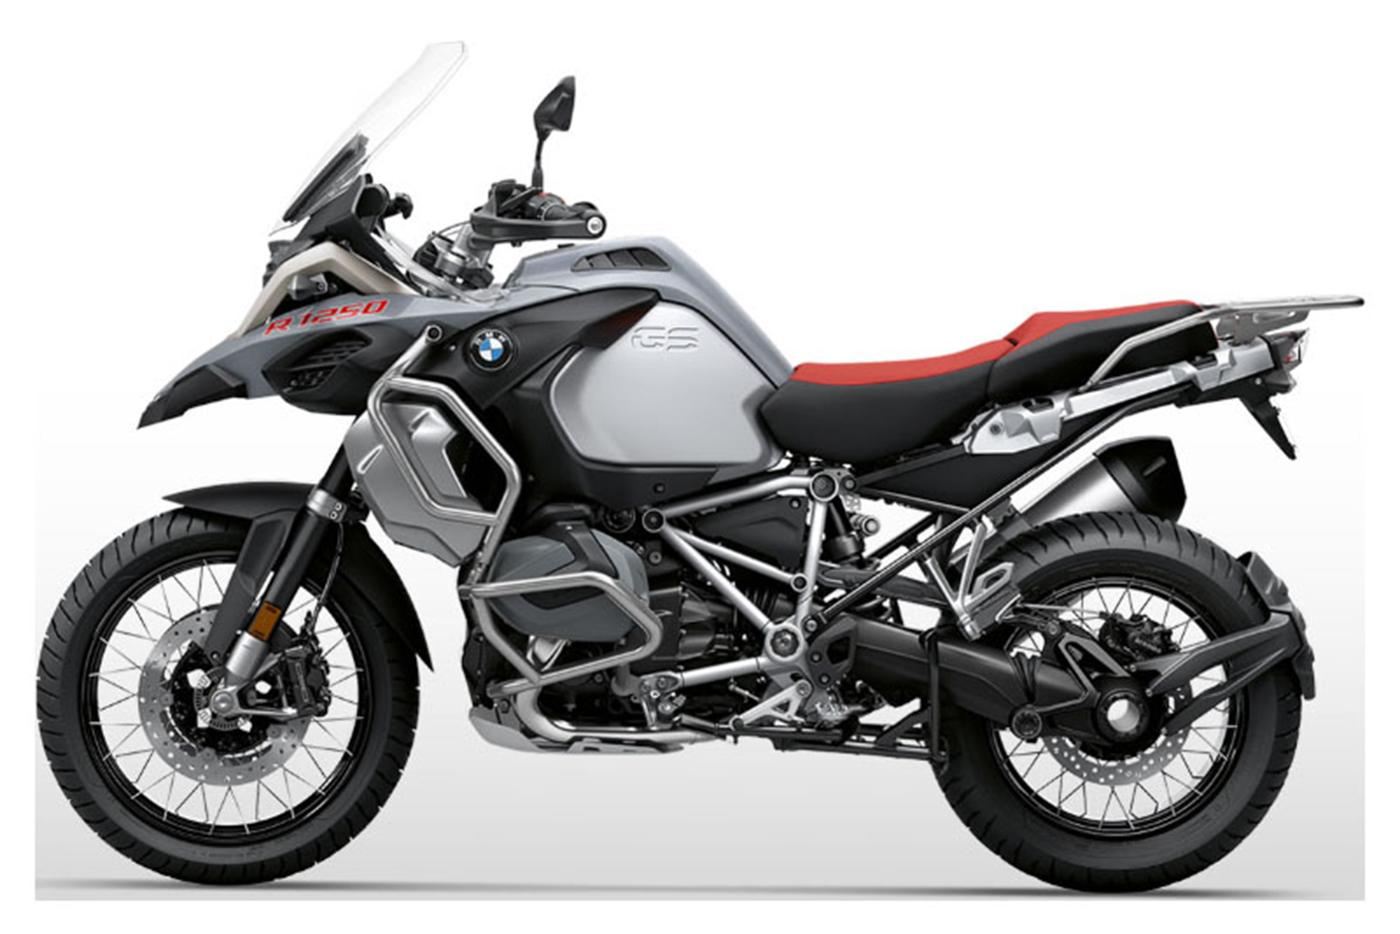 bmw-r-1250-gs-adventure-2020-5.jpg